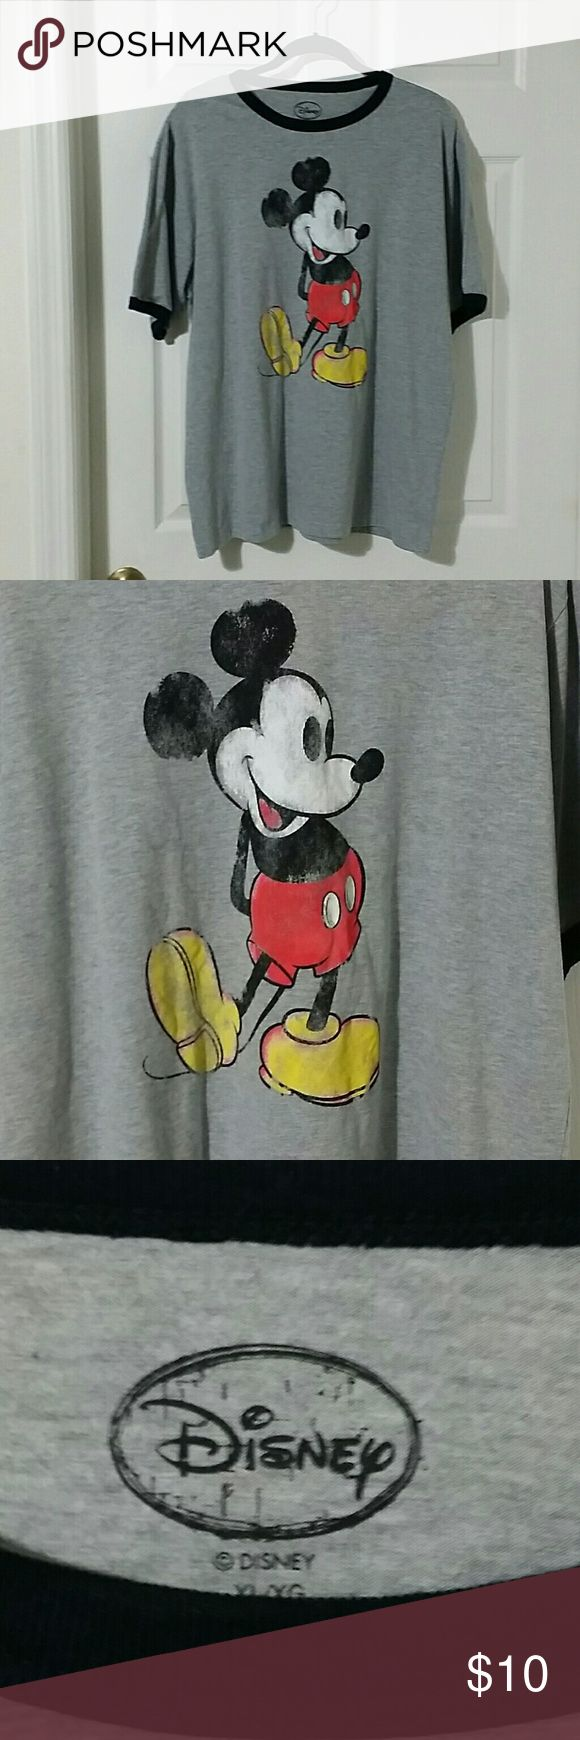 MEN'S SHIRT MEN'S SHIRT Disney Shirts